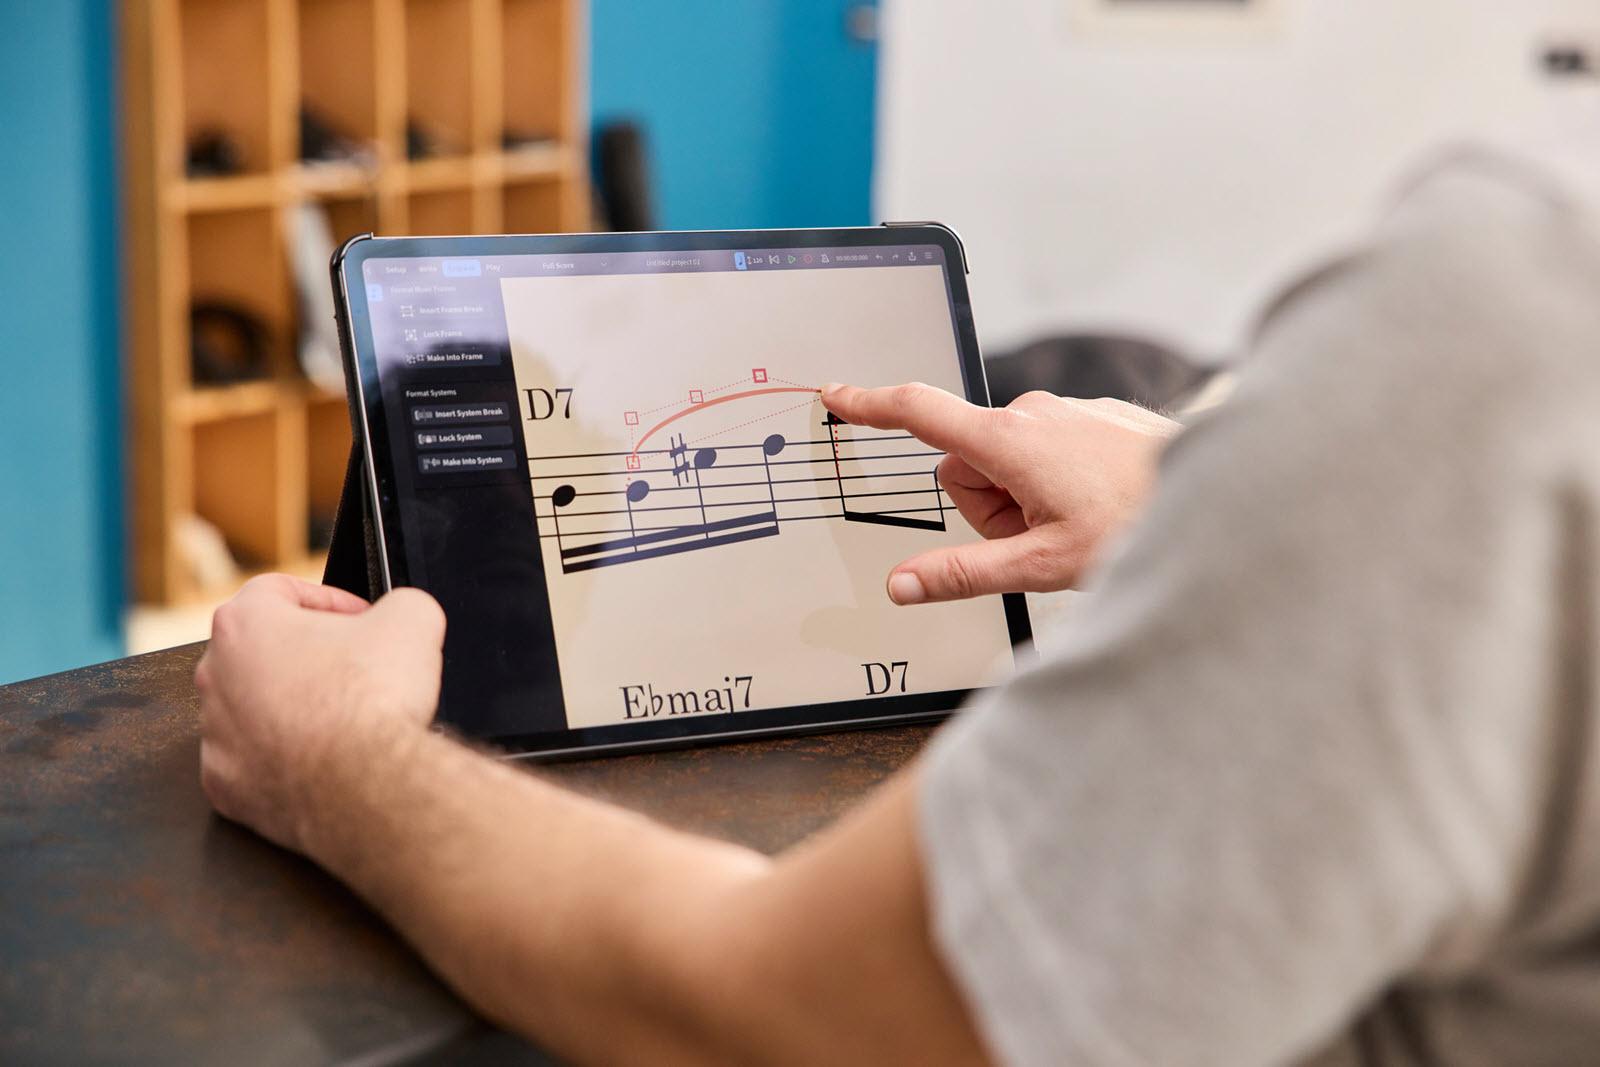 Steinberg(斯坦伯格)推出免费iPad版音乐打谱软件Dorico(视频)